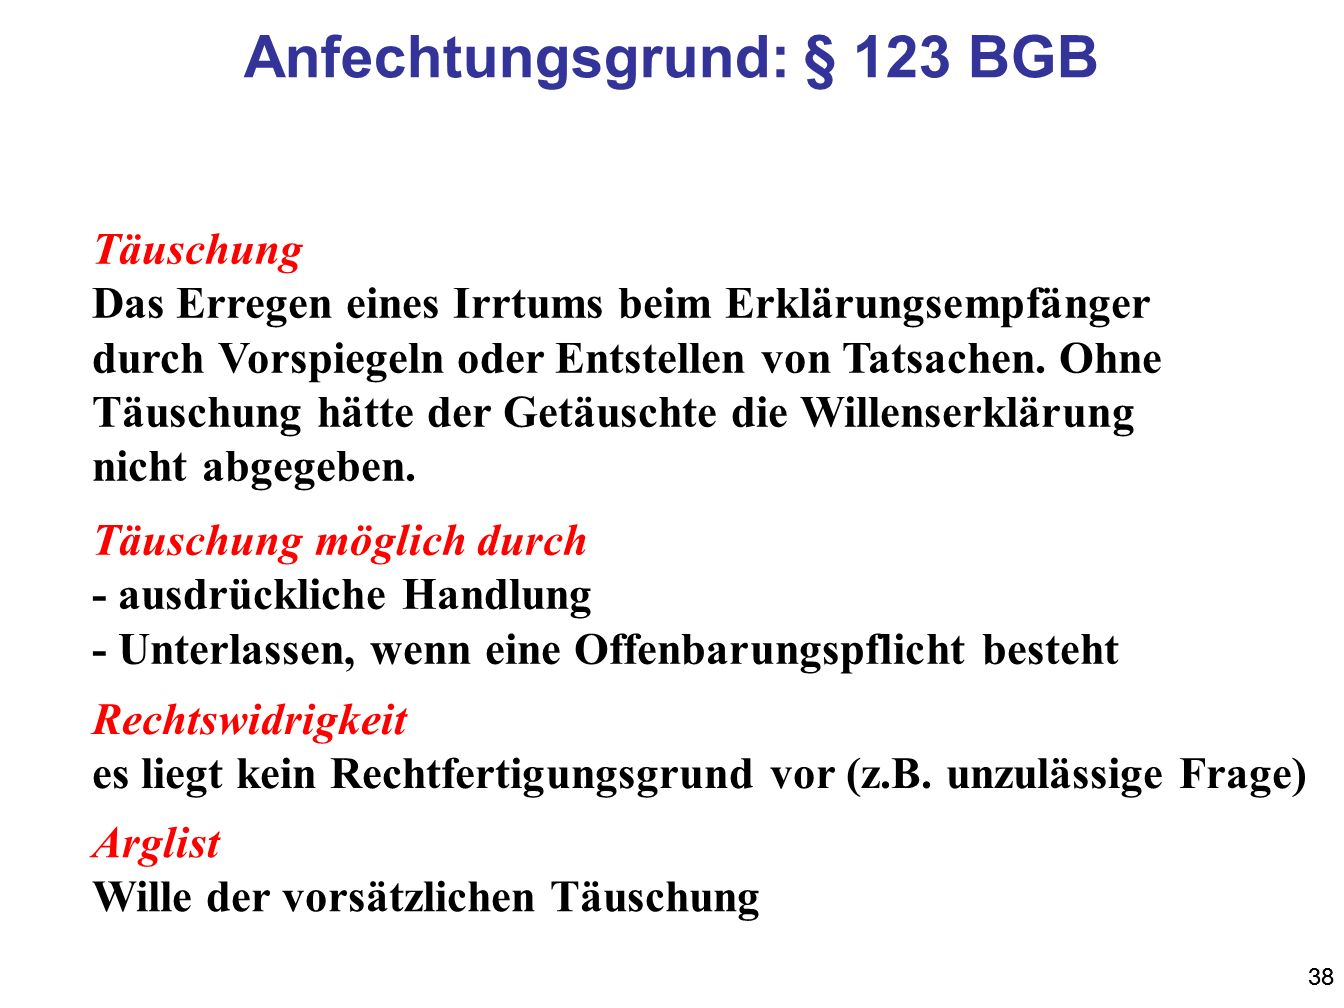 Anfechtungsgrund: § 123 BGB